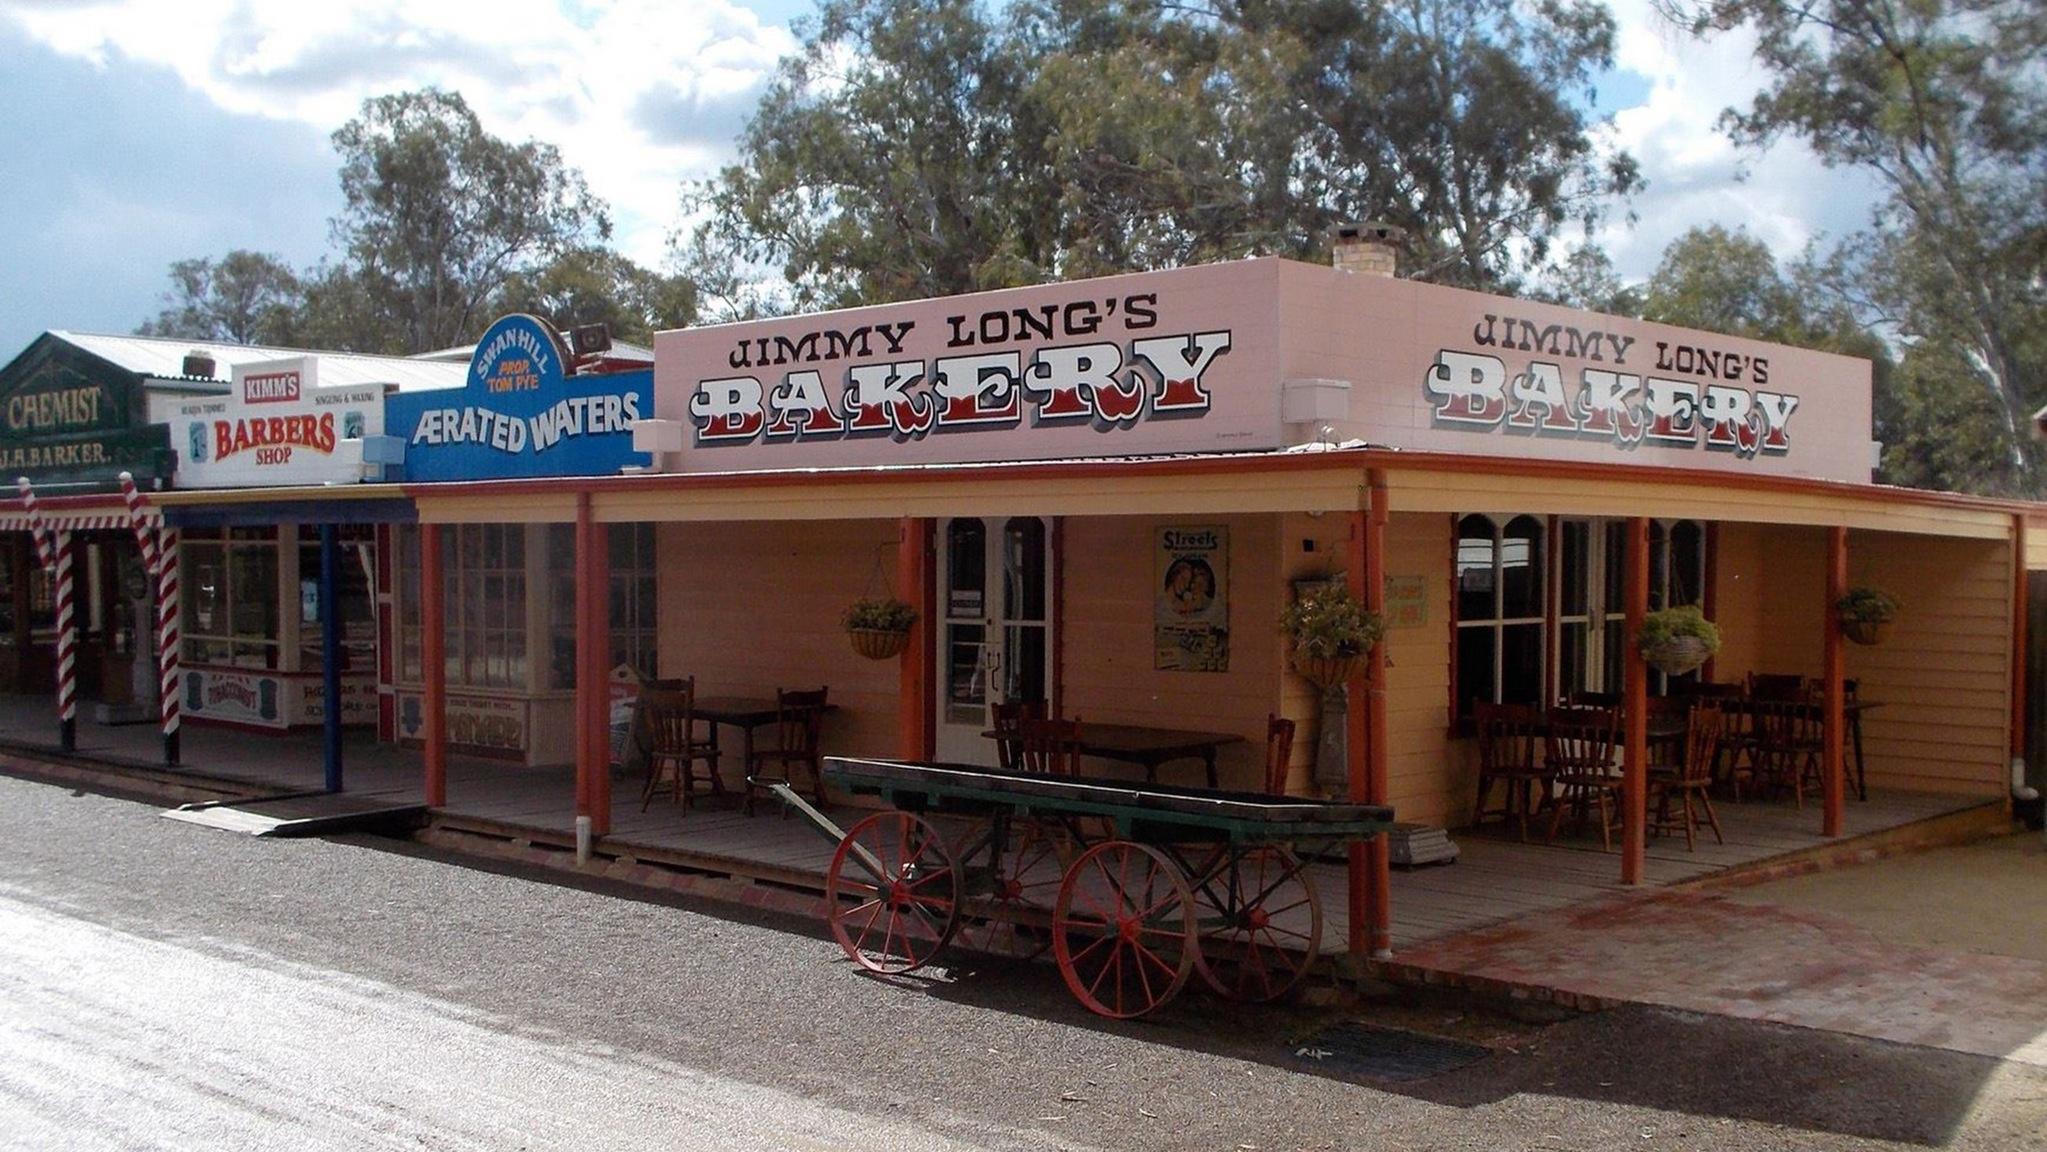 Jimmy Long's Bakery